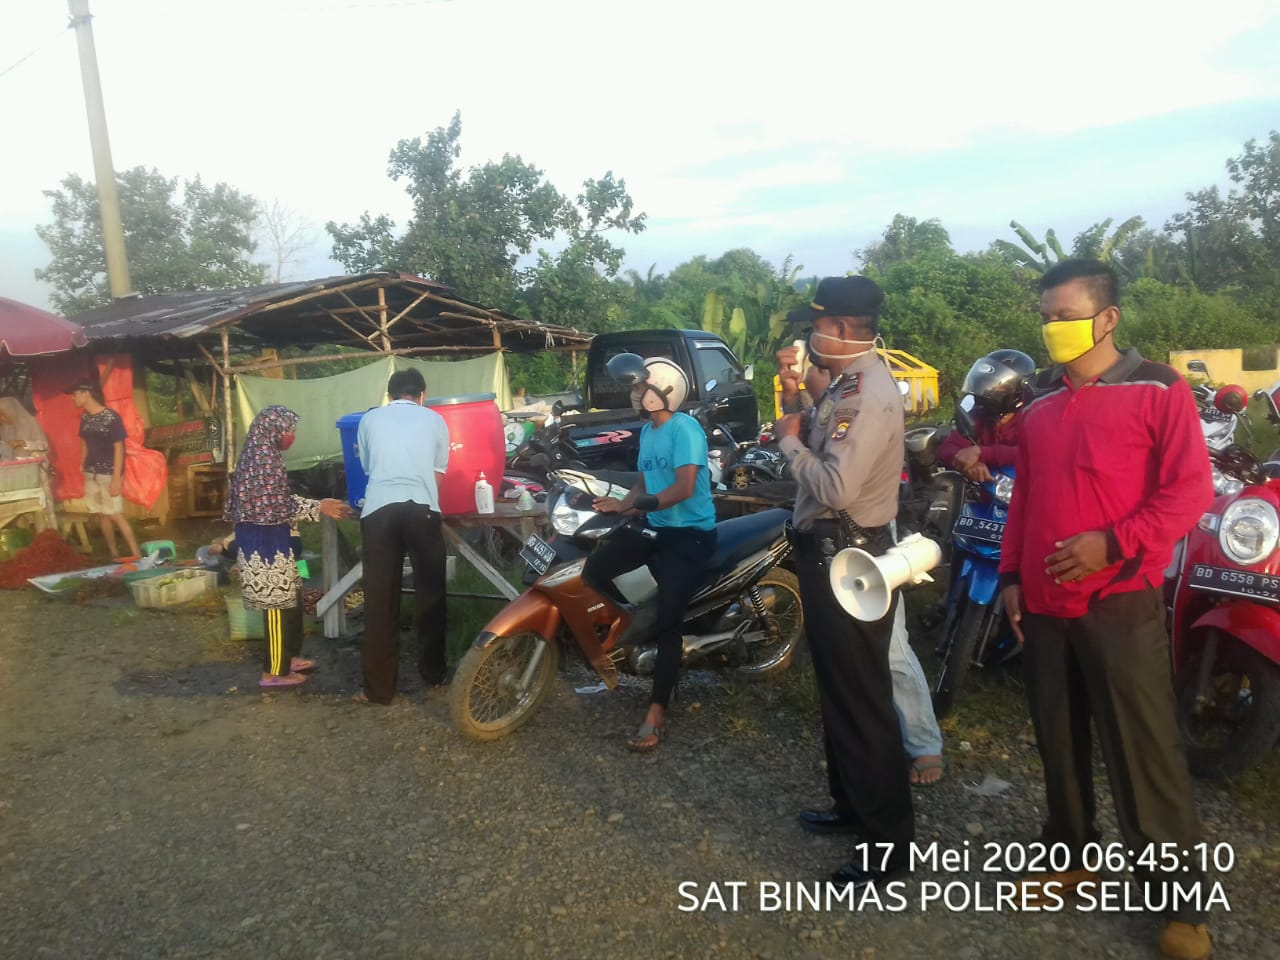 Binluh di Pasar Sembayat, Binmas Polres Seluma Bagikan Masker